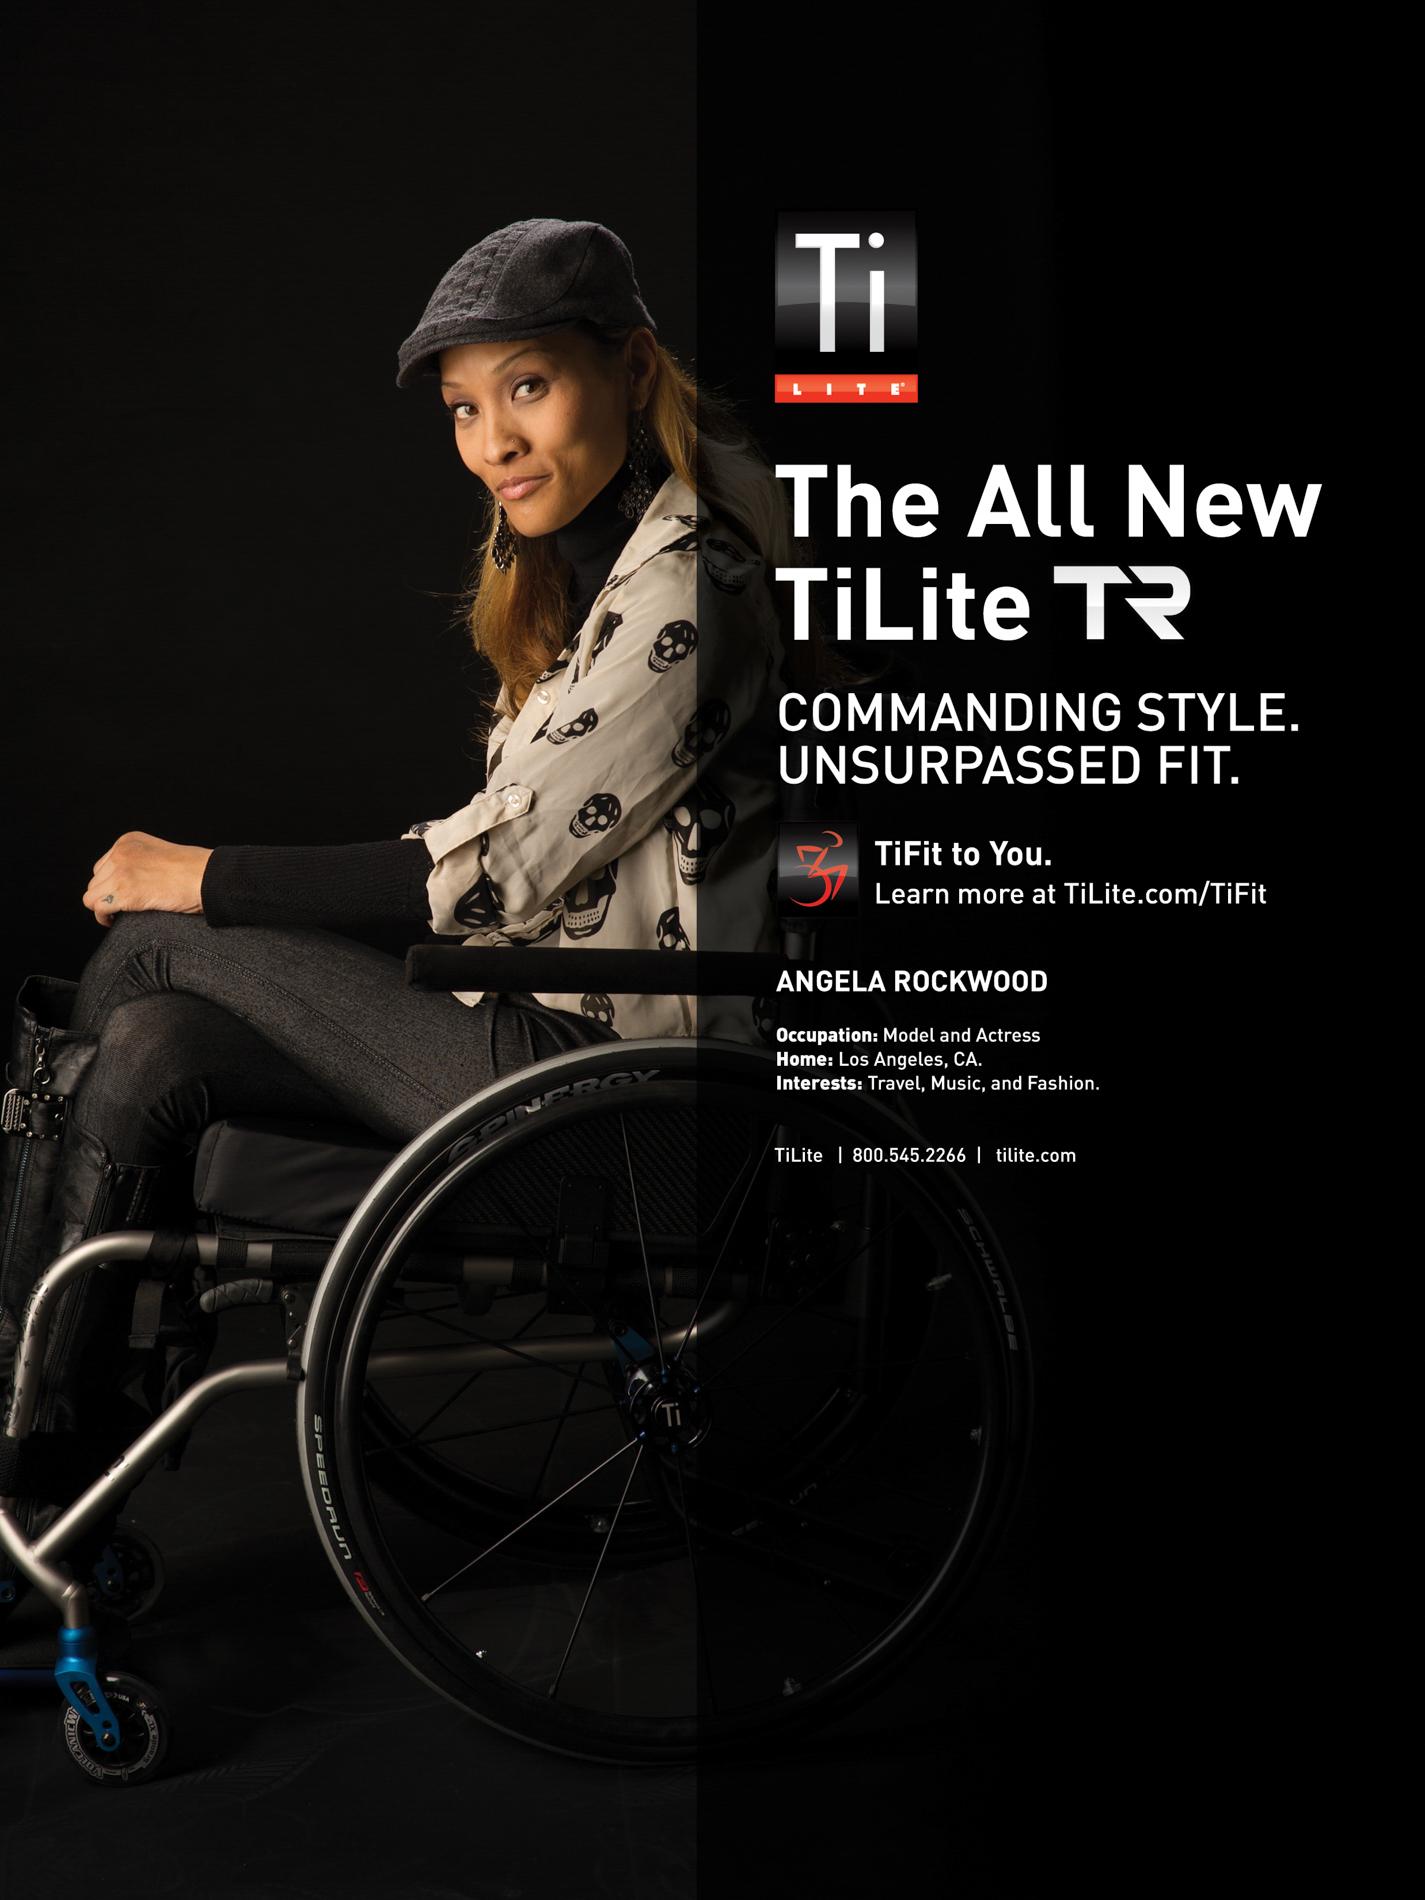 Advertisement for TiLite